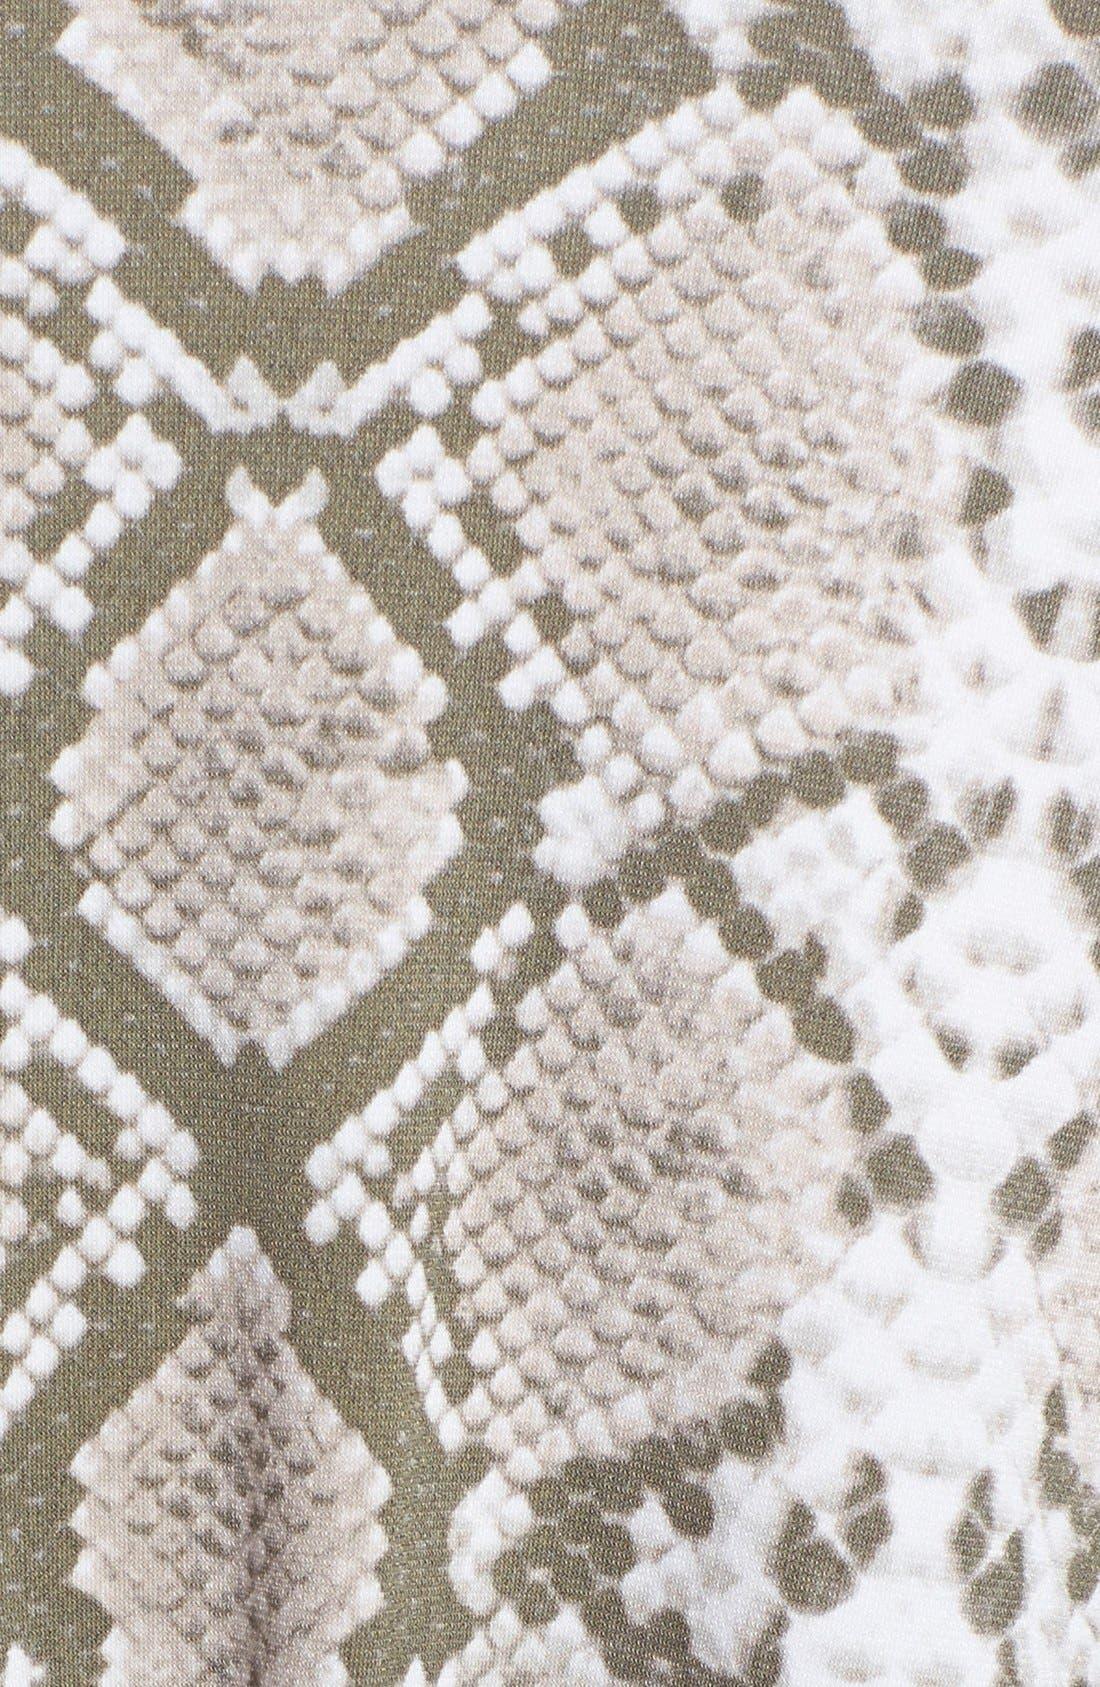 VINCE CAMUTO, Snake Print Satin Maxi Dress, Alternate thumbnail 3, color, 250